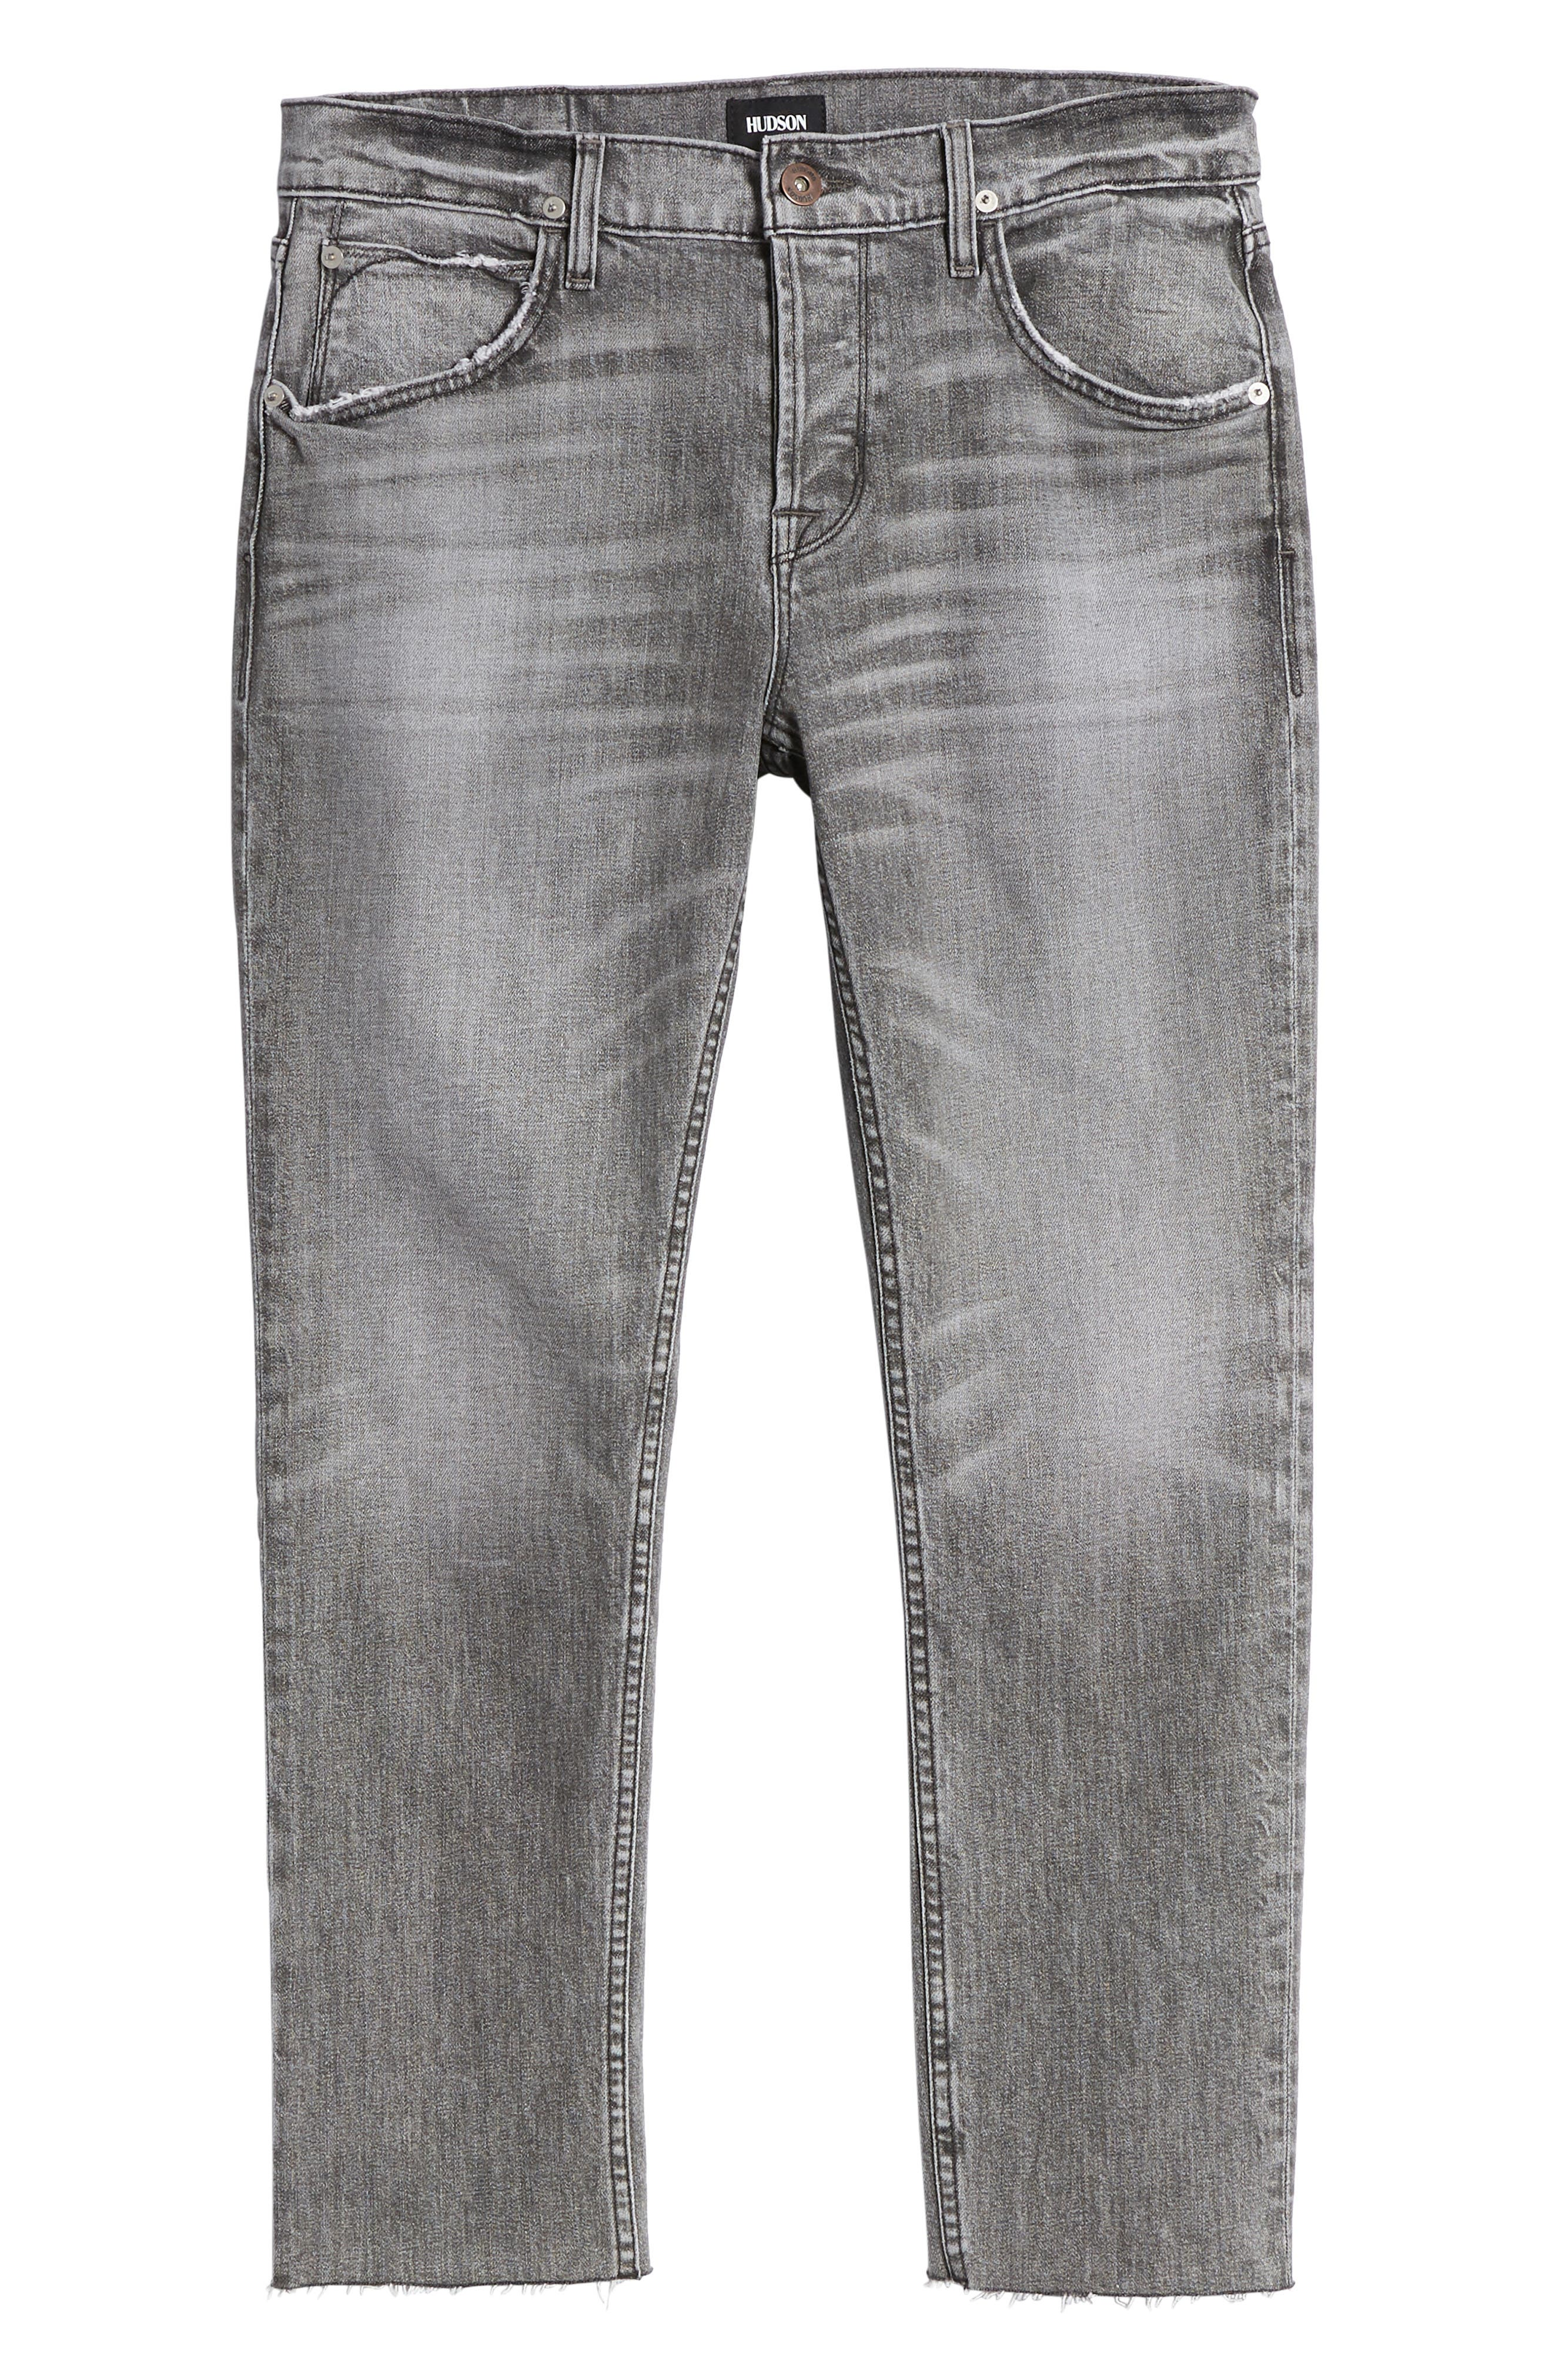 HUDSON JEANS,                             Blake Slim Fit Jeans,                             Alternate thumbnail 6, color,                             063